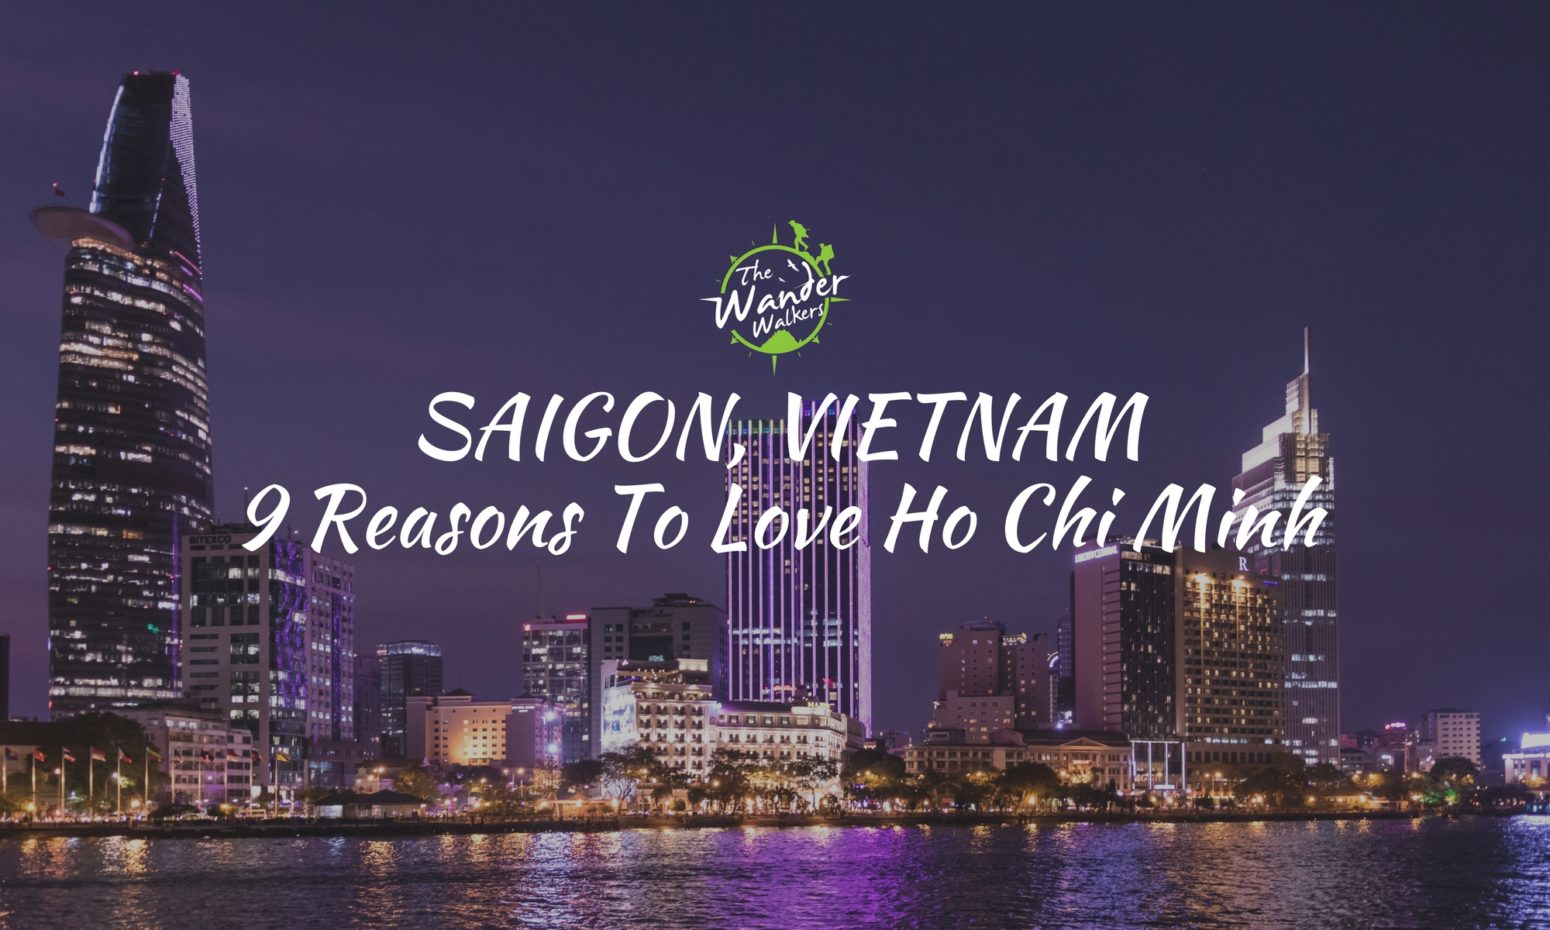 saigon vietnam pictures